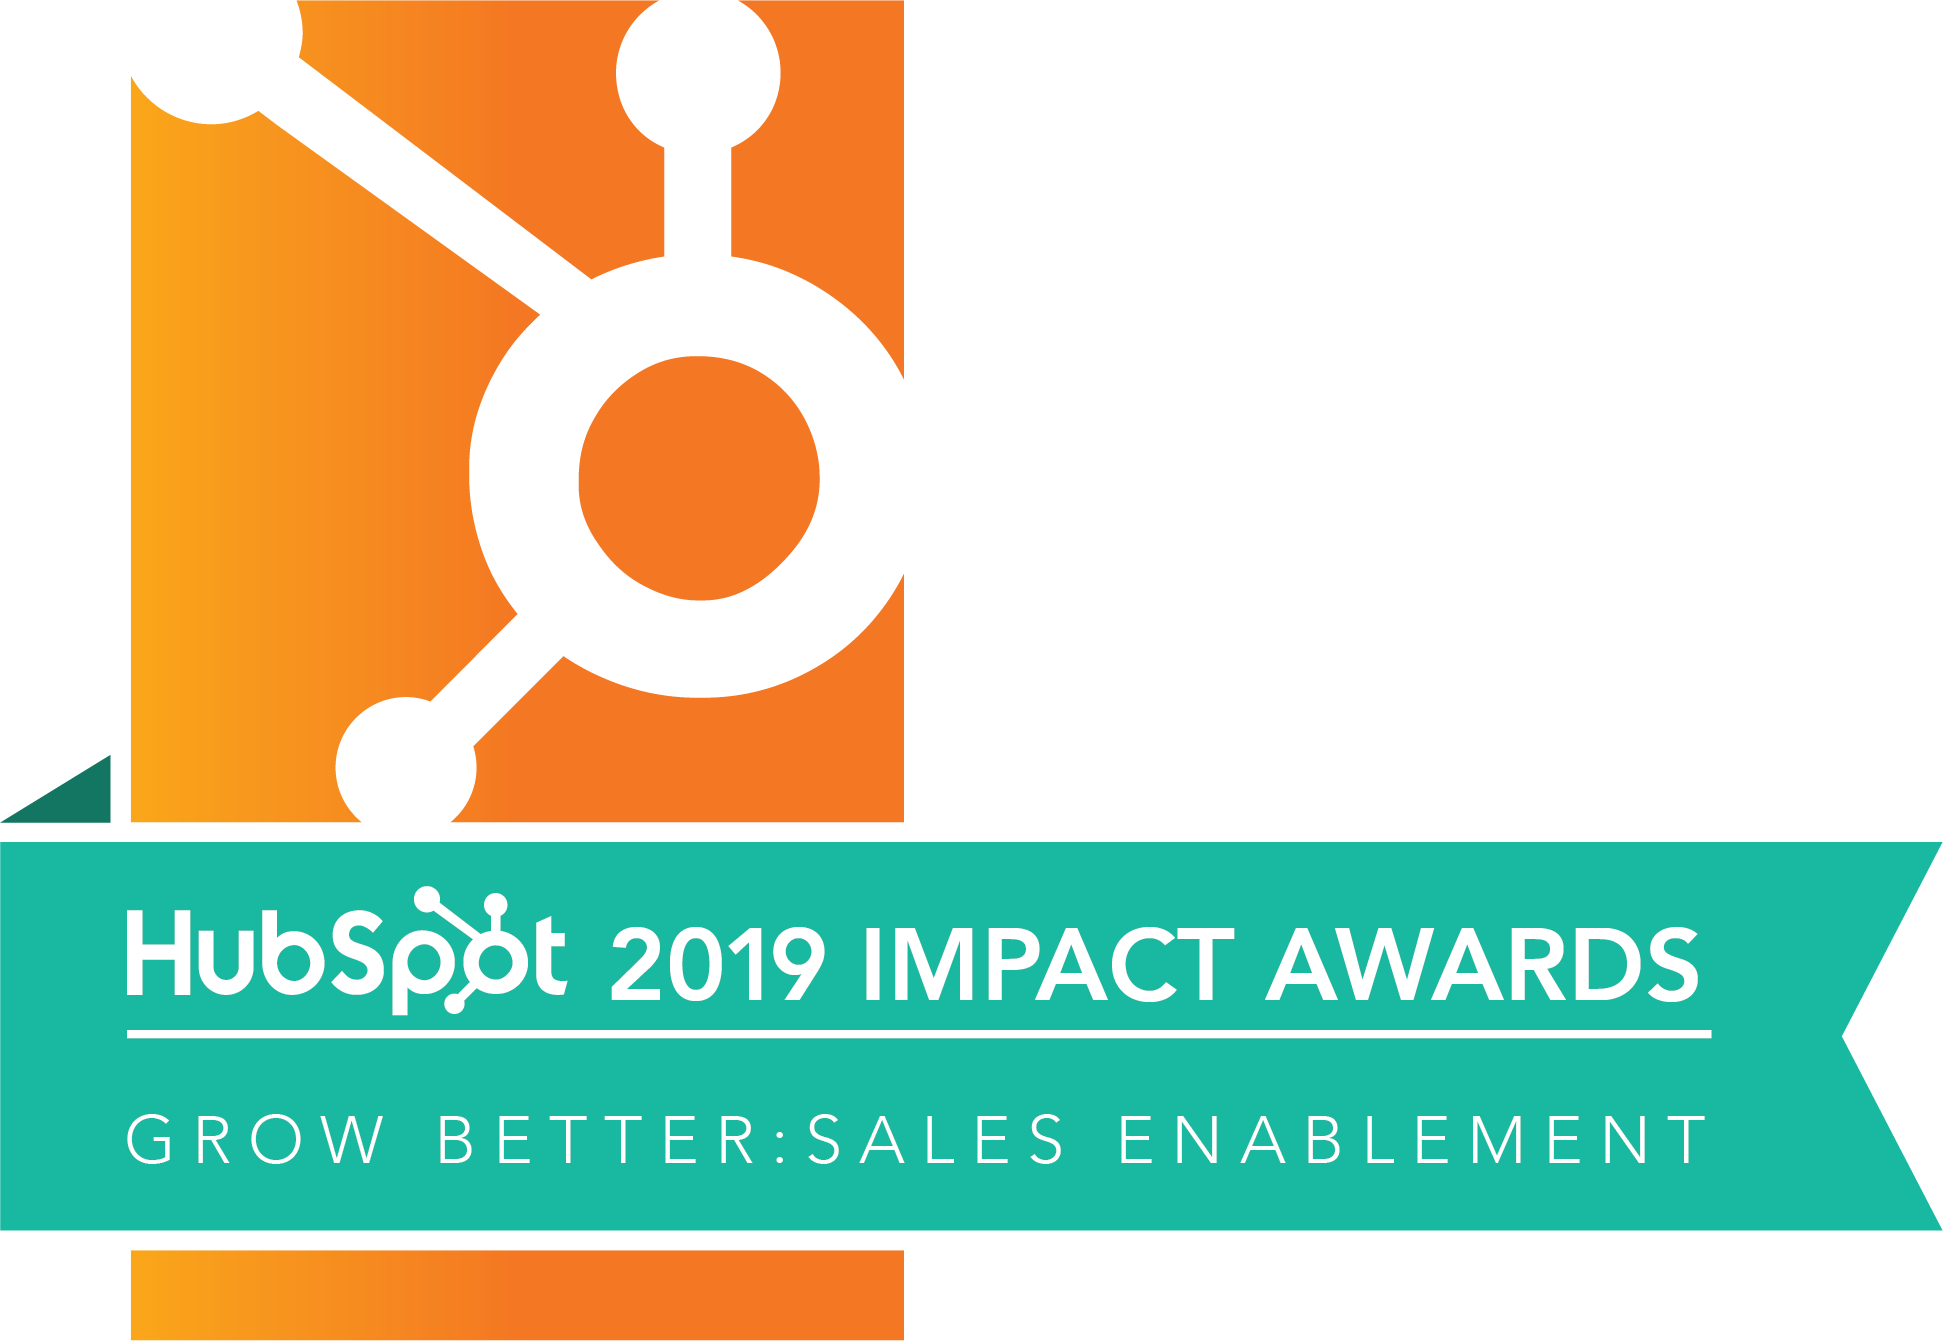 2019 Sales Enablement Impact Award Winner